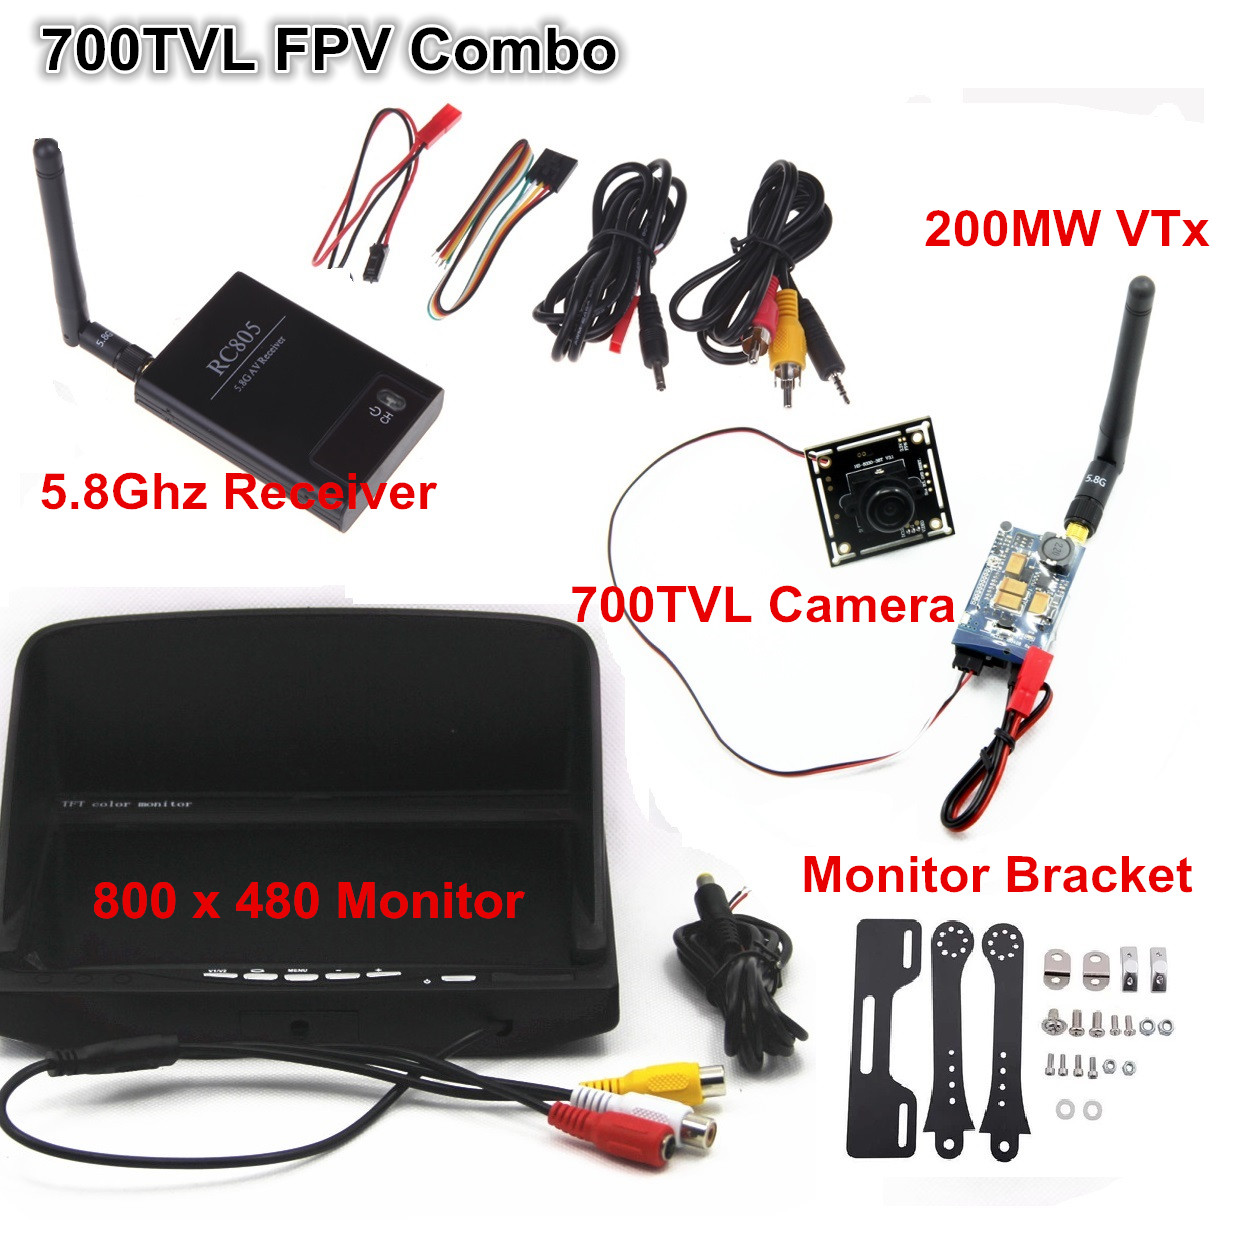 5.8ghz FPV Combo Boscam 5.8g 200mw Tx + Recevier RC805 + 800 x 480 Monitor + 700TVL Camera + Mounting Bracket Set fpv display mounting bracket metal holder shortcut for dji rc transmitter